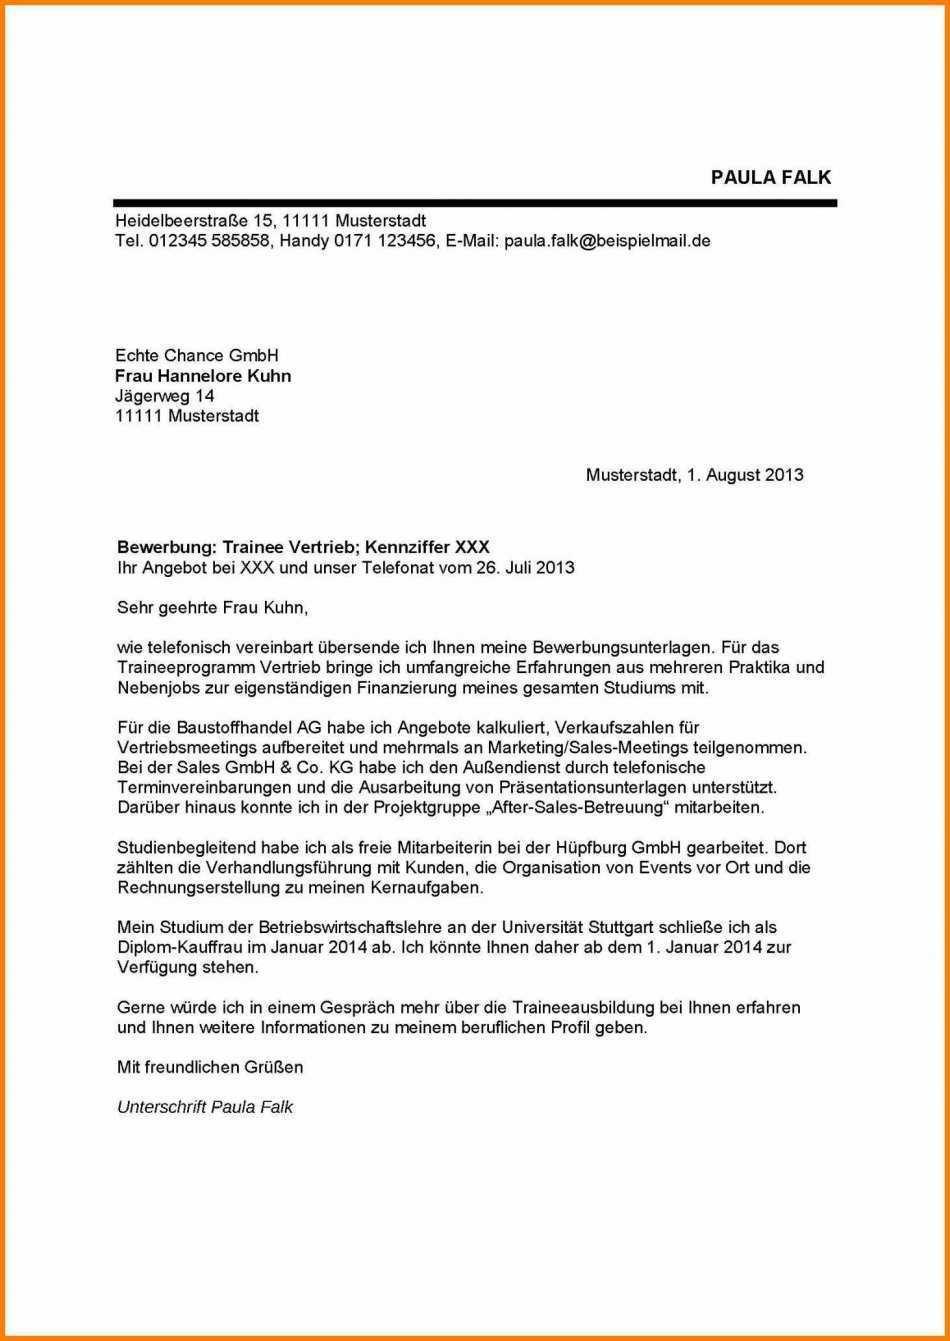 14 Briefkopf Vorlage Openoffice Kostenlos Chartersnovaair Com